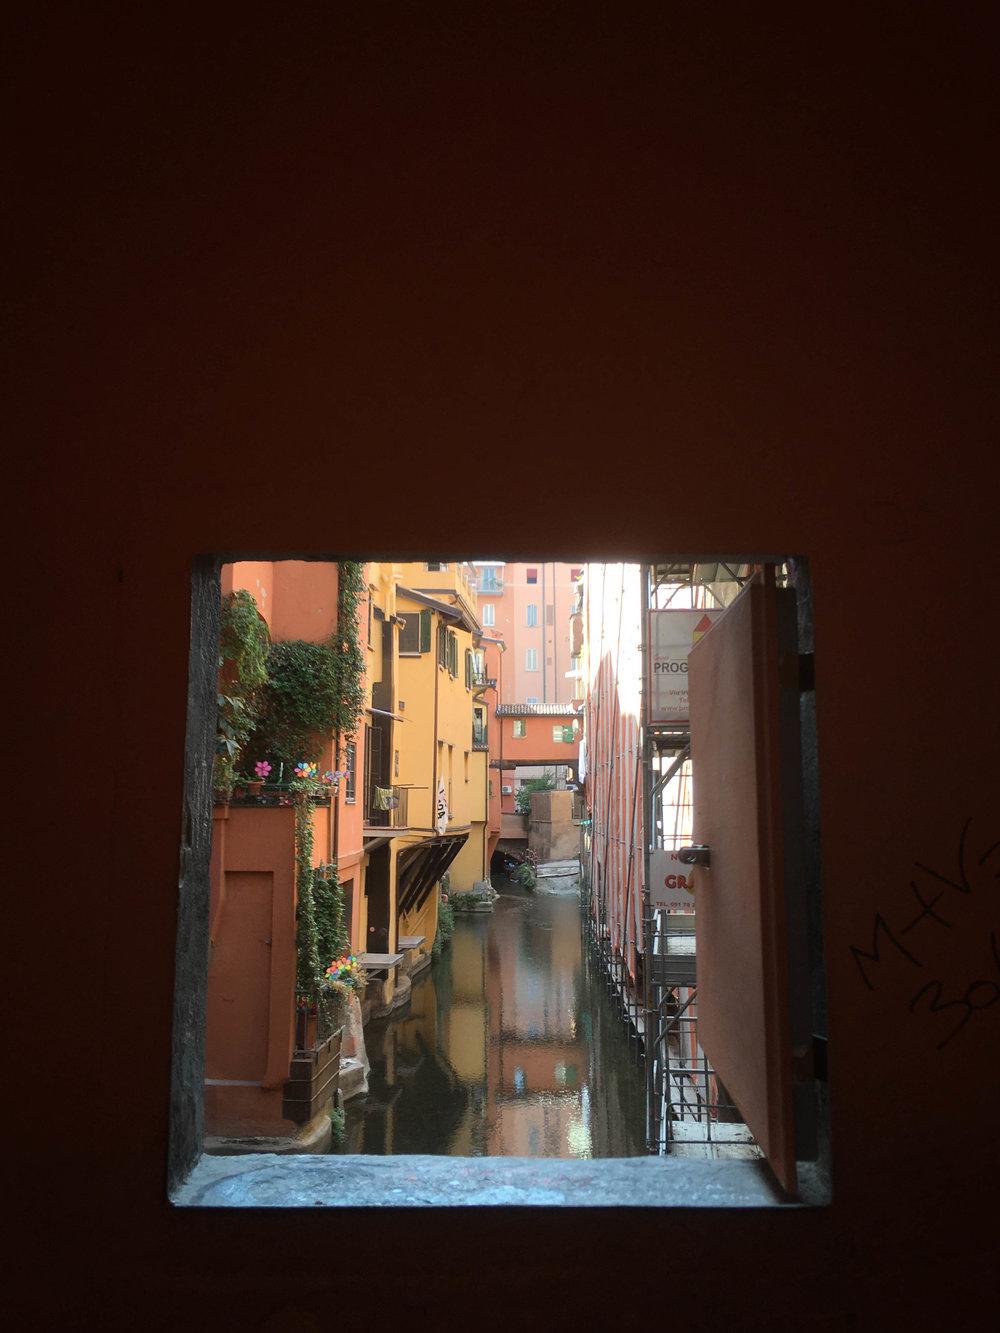 Bologna's Little Venice